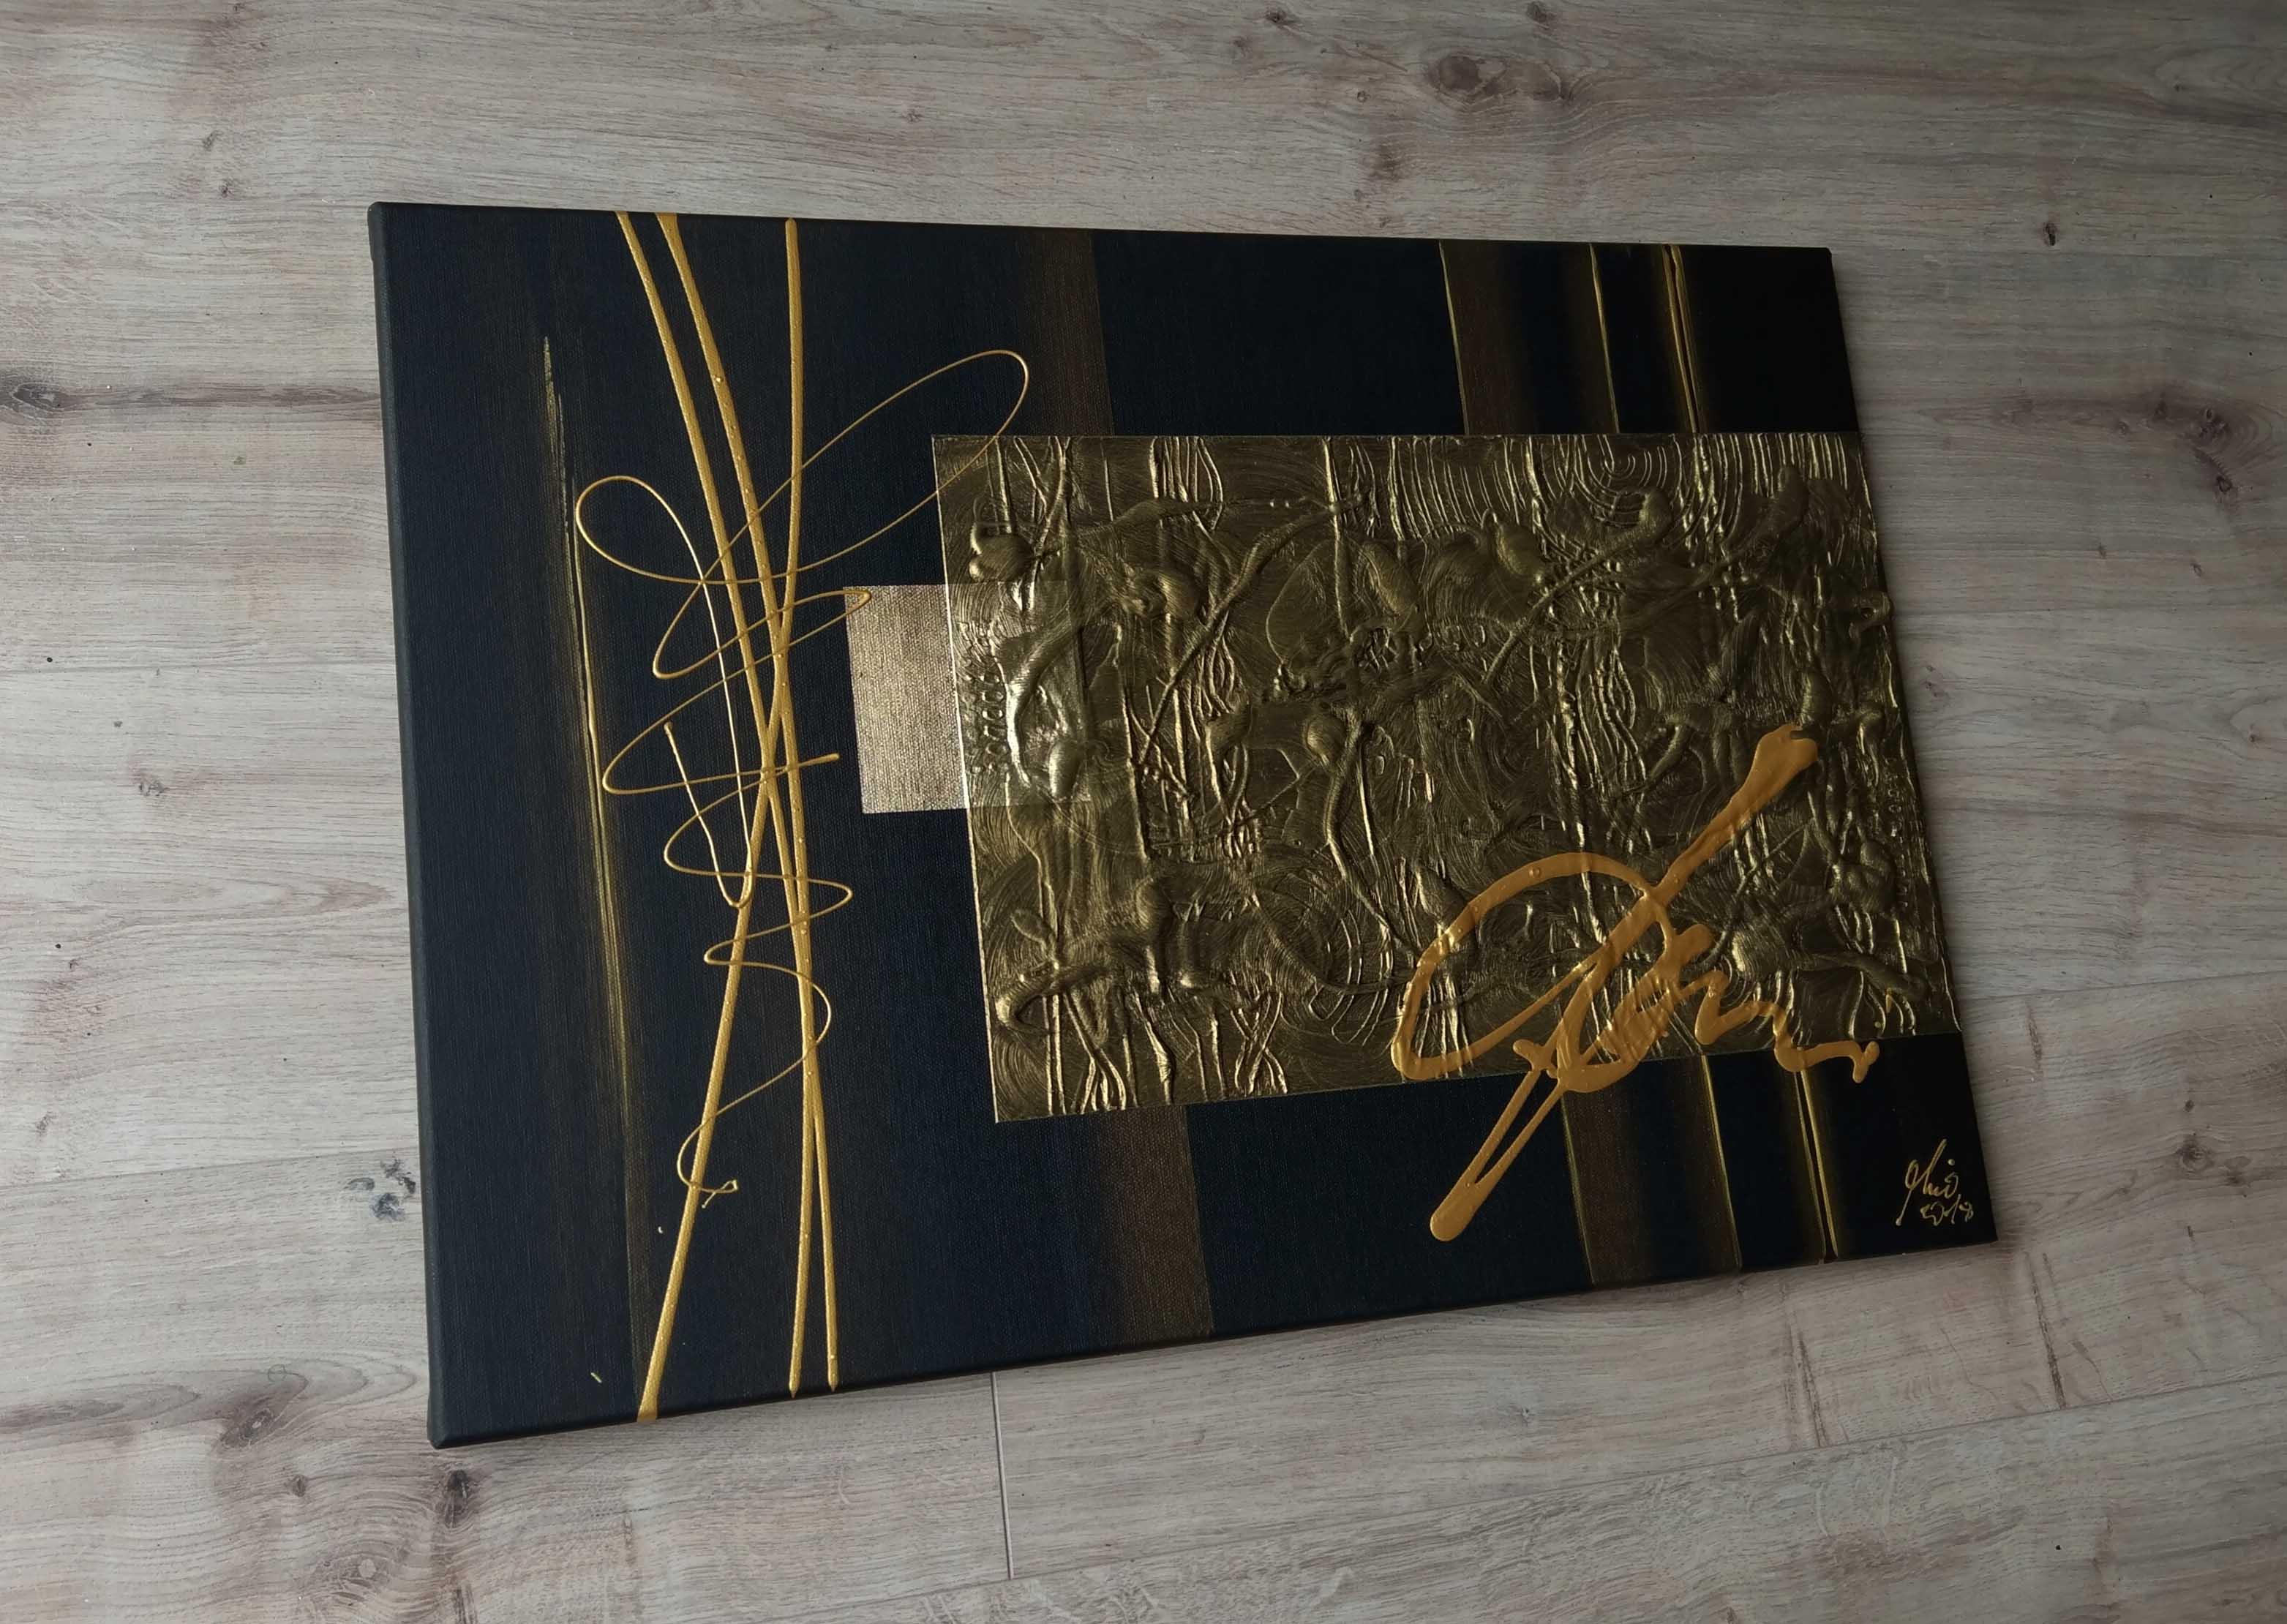 mico original abstrakt wandbild moderne bilder kaufen. Black Bedroom Furniture Sets. Home Design Ideas